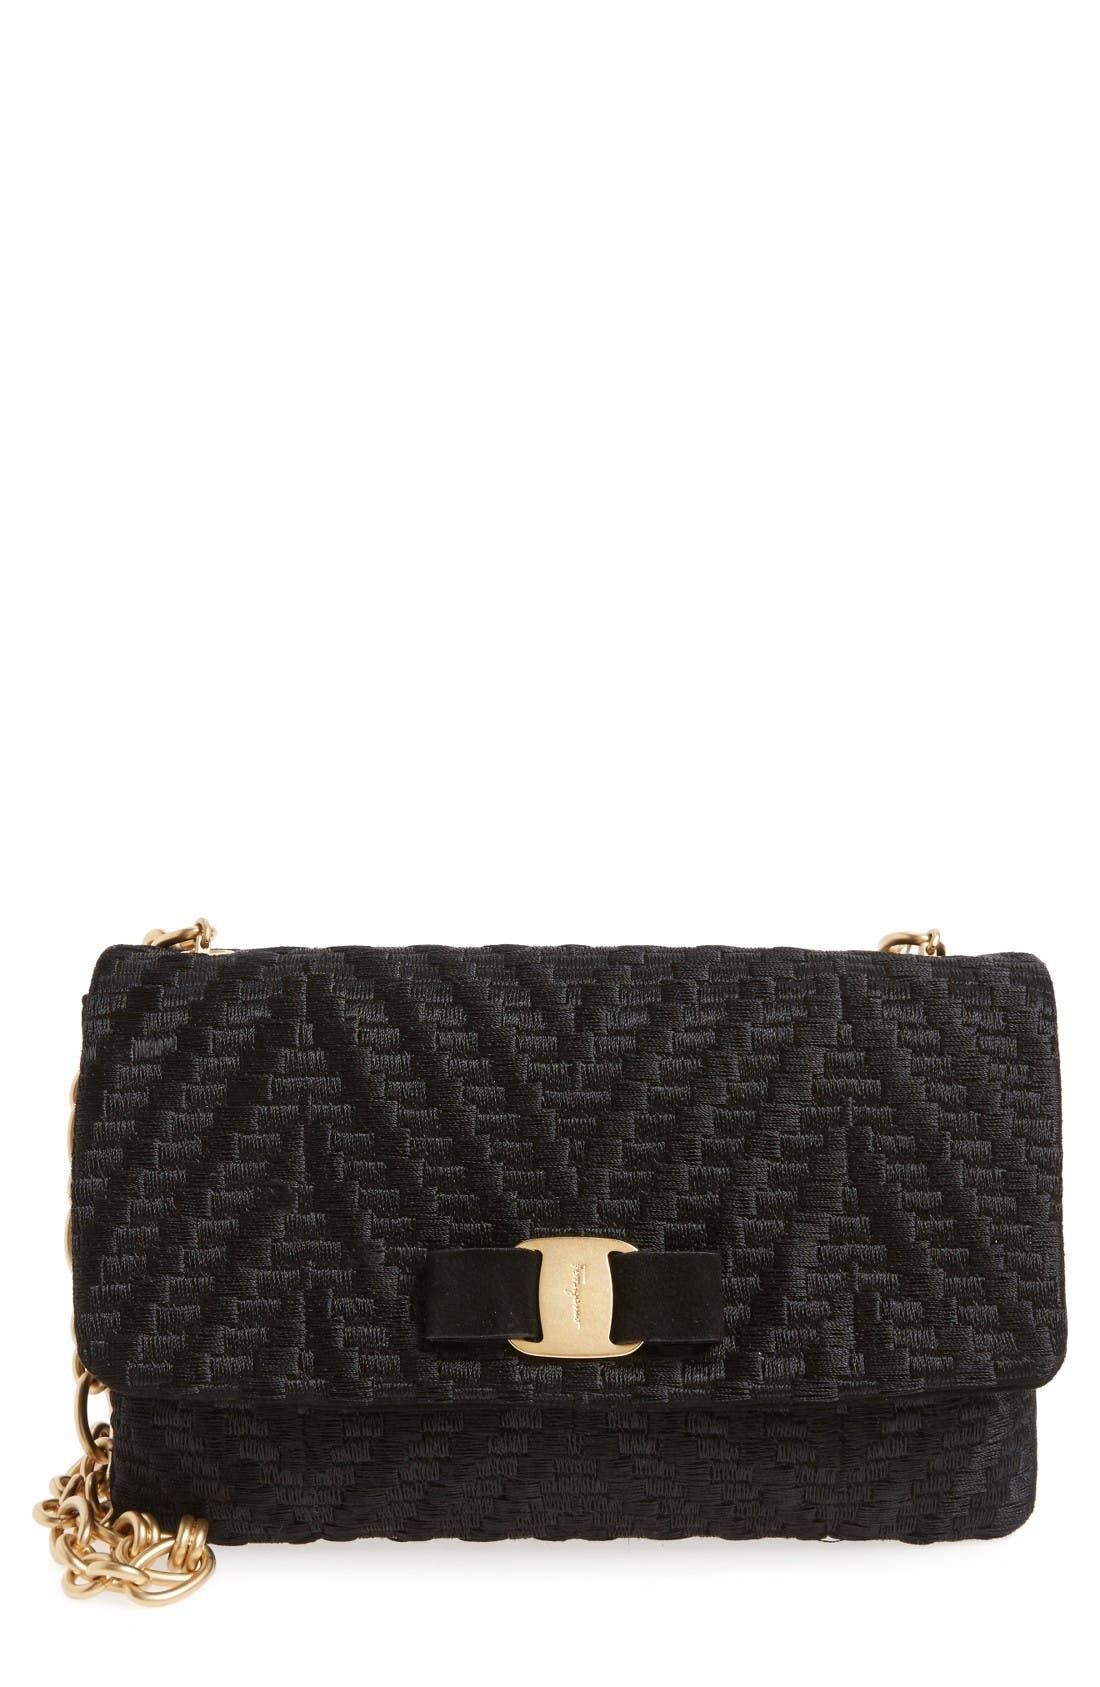 SALVATORE FERRAGAMO Ginny Textured Shoulder Bag